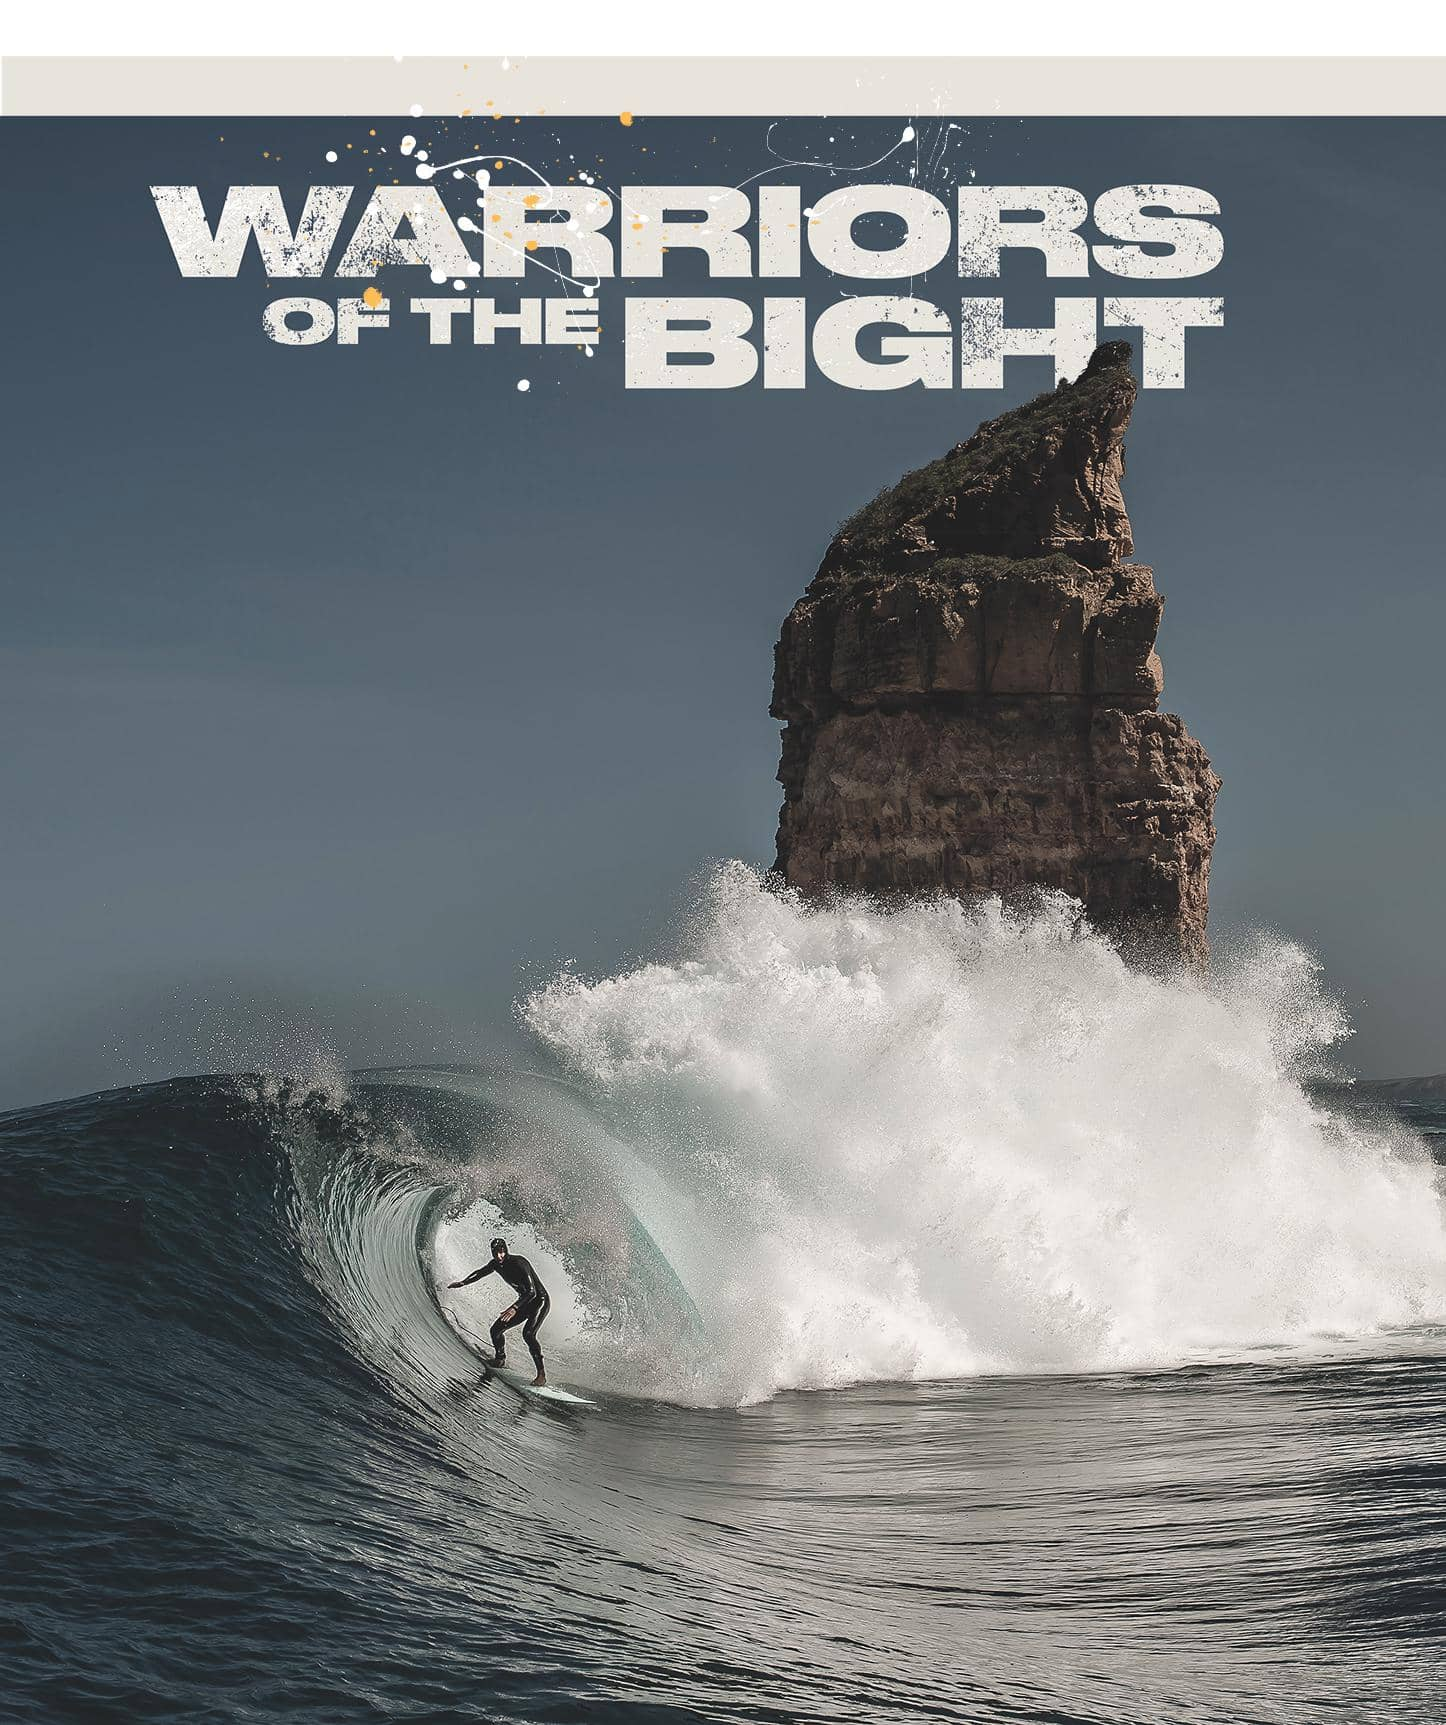 WARRIORS OF THE BIGHT